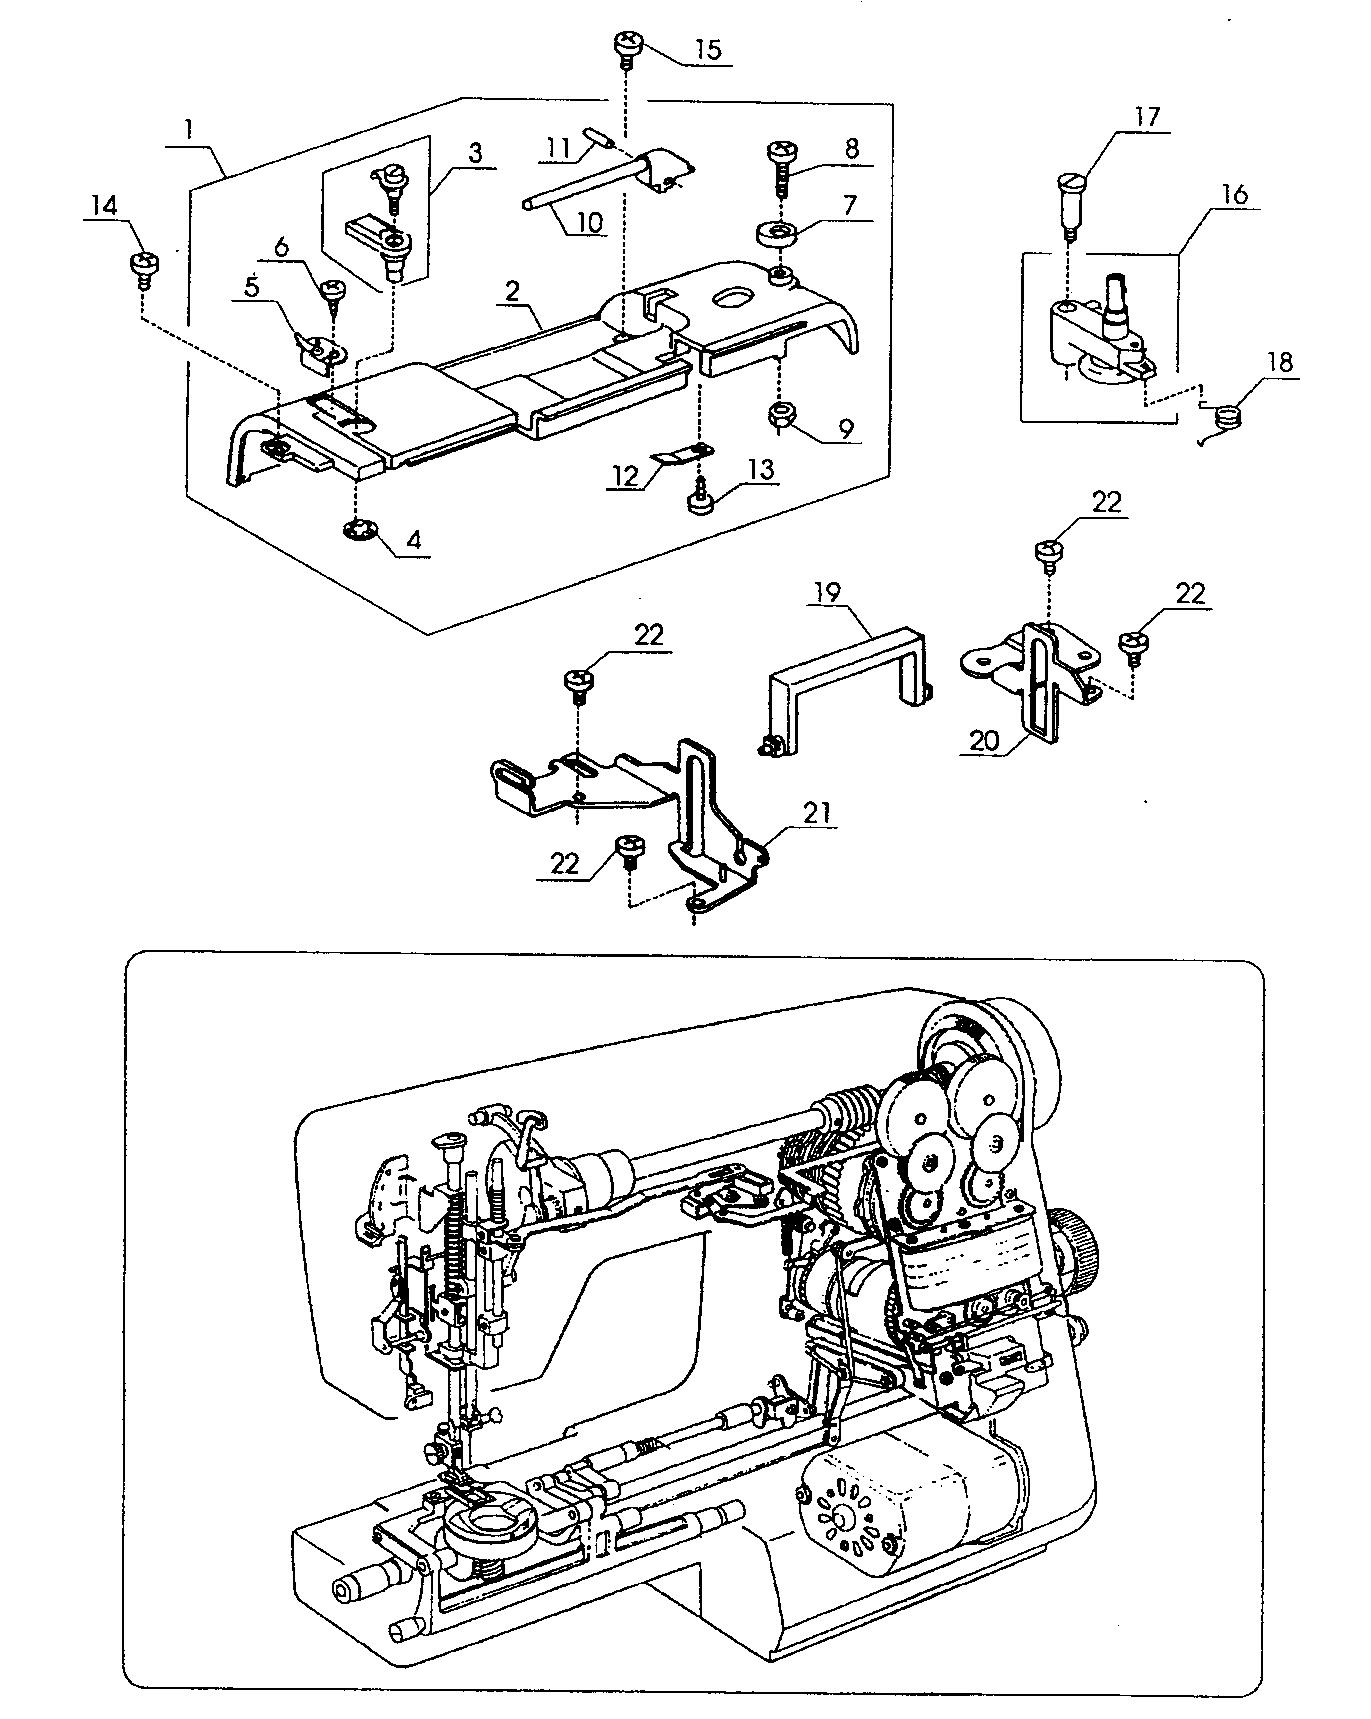 Terrific Wrg 7069 Sewing Machine Wiring Diagram Wiring Cloud Onicaxeromohammedshrineorg